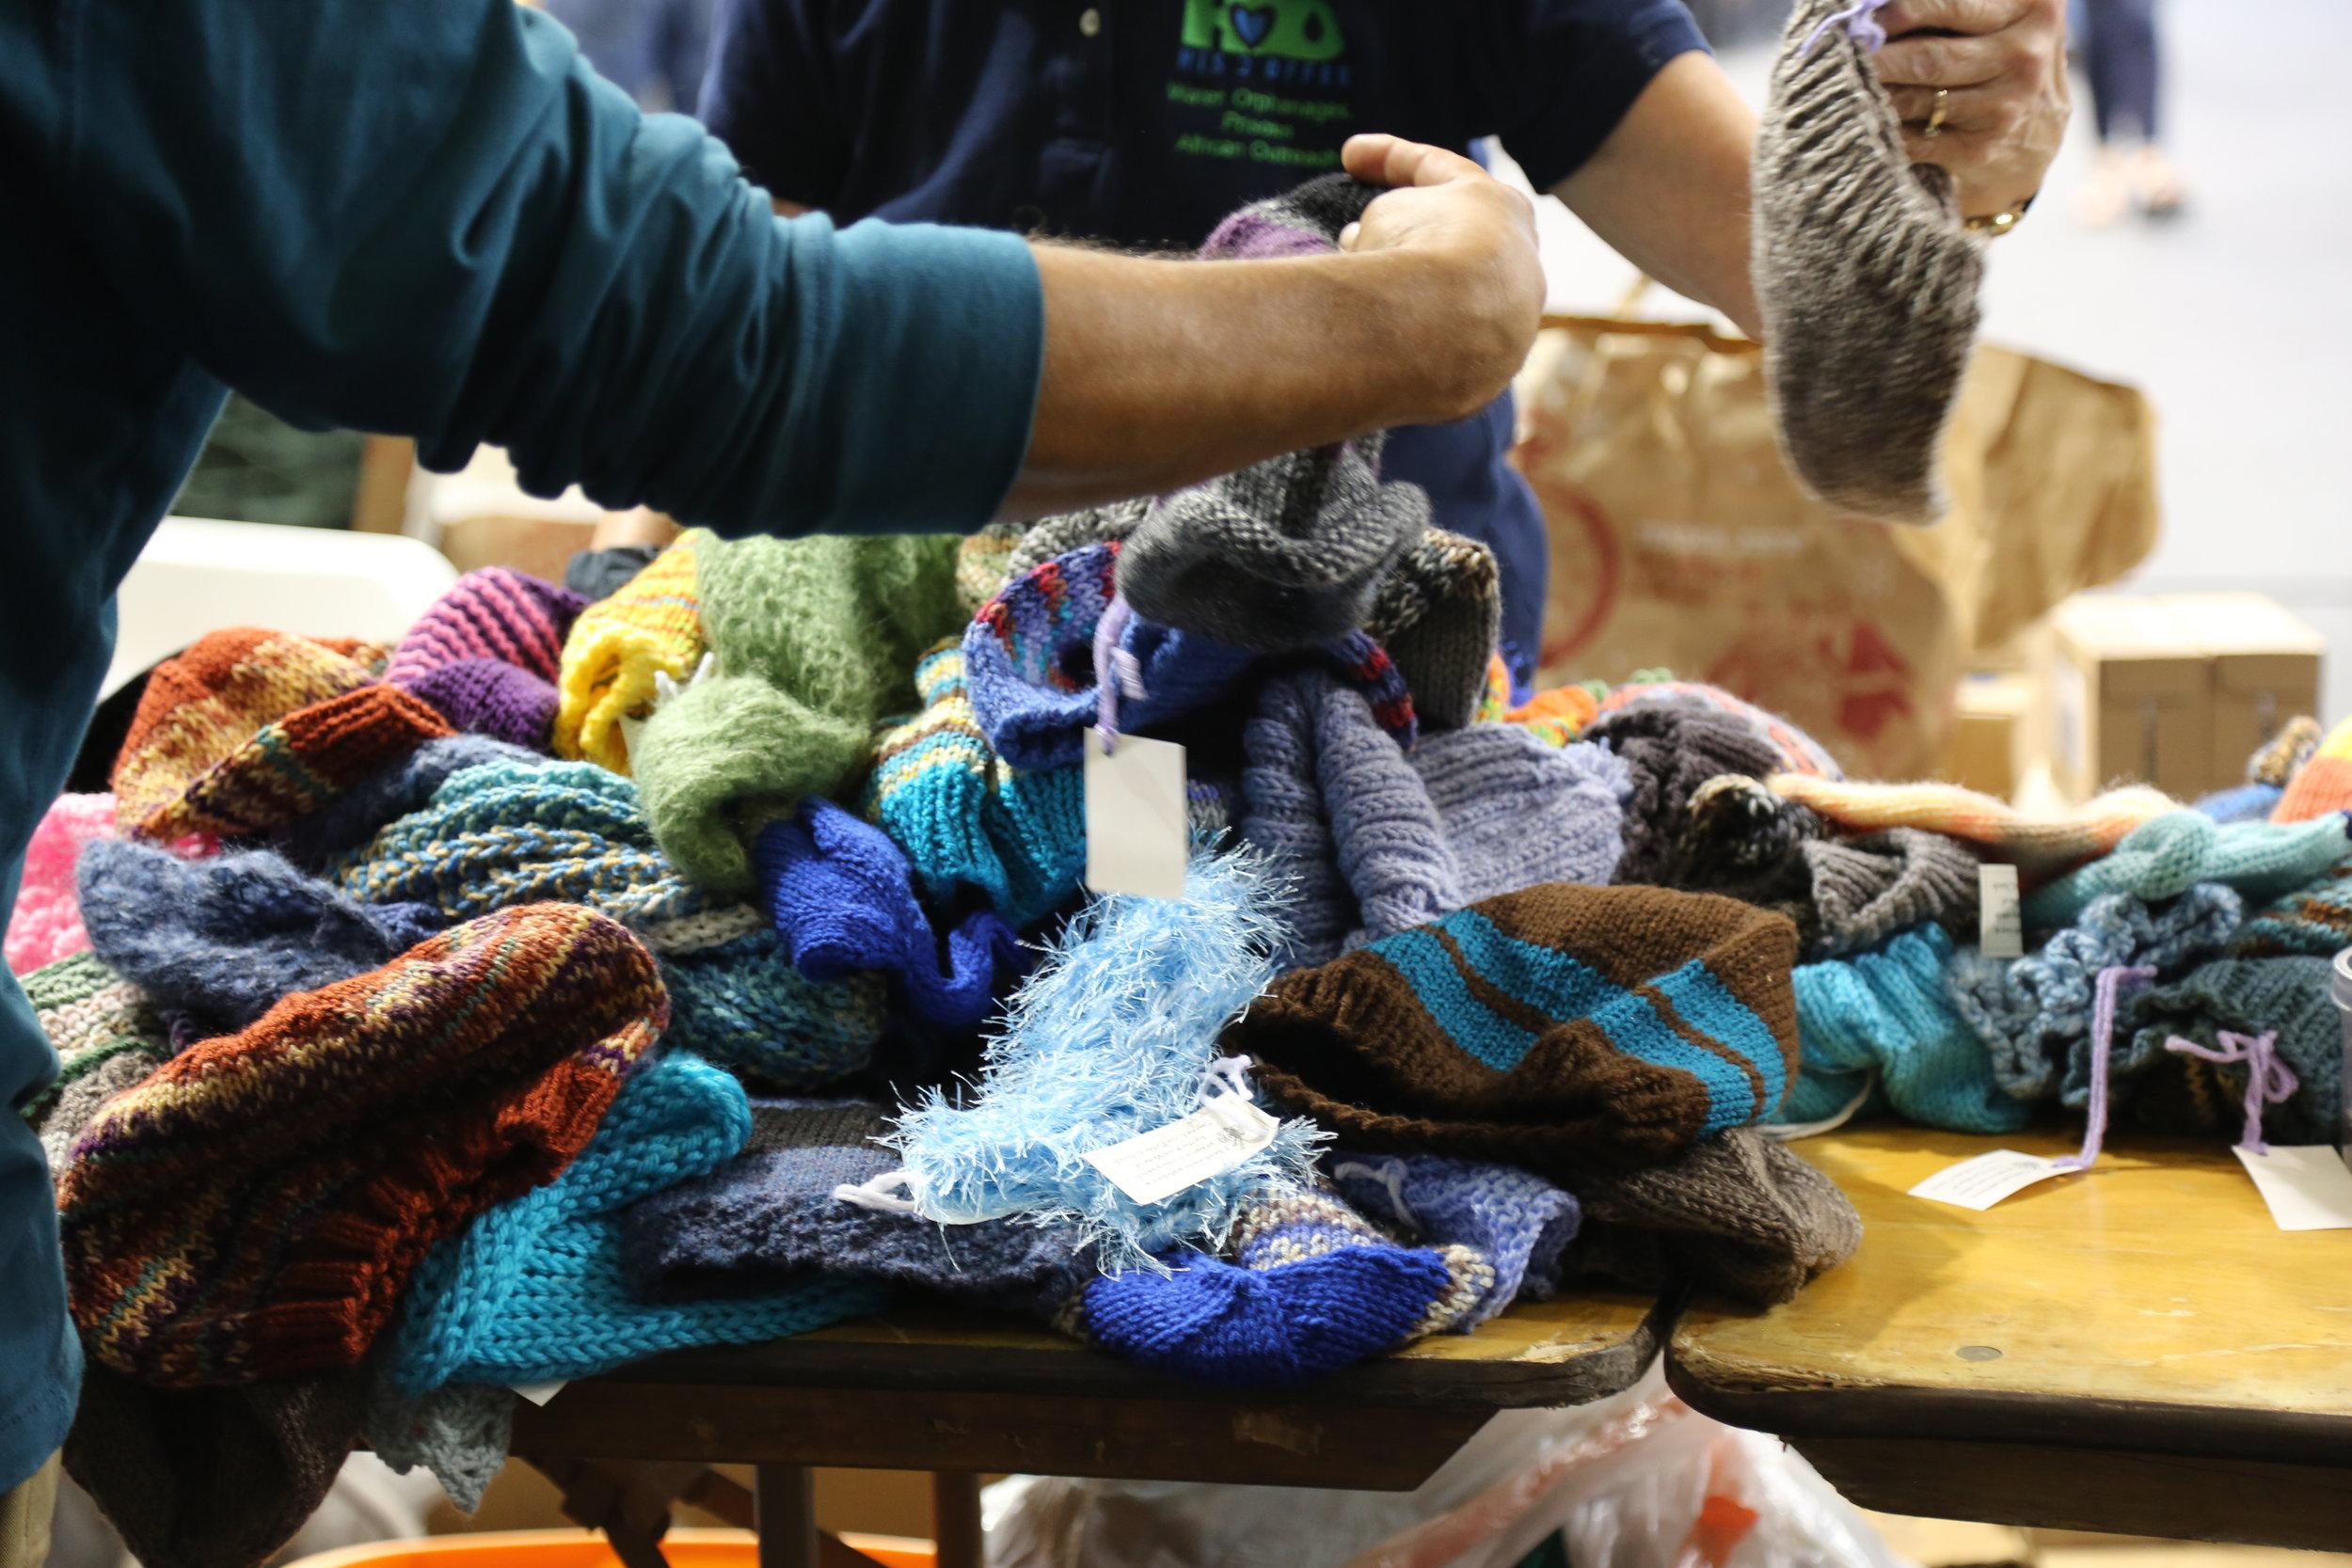 free-socks-and-clothes-santa-cruz-county-for-homeless.JPG